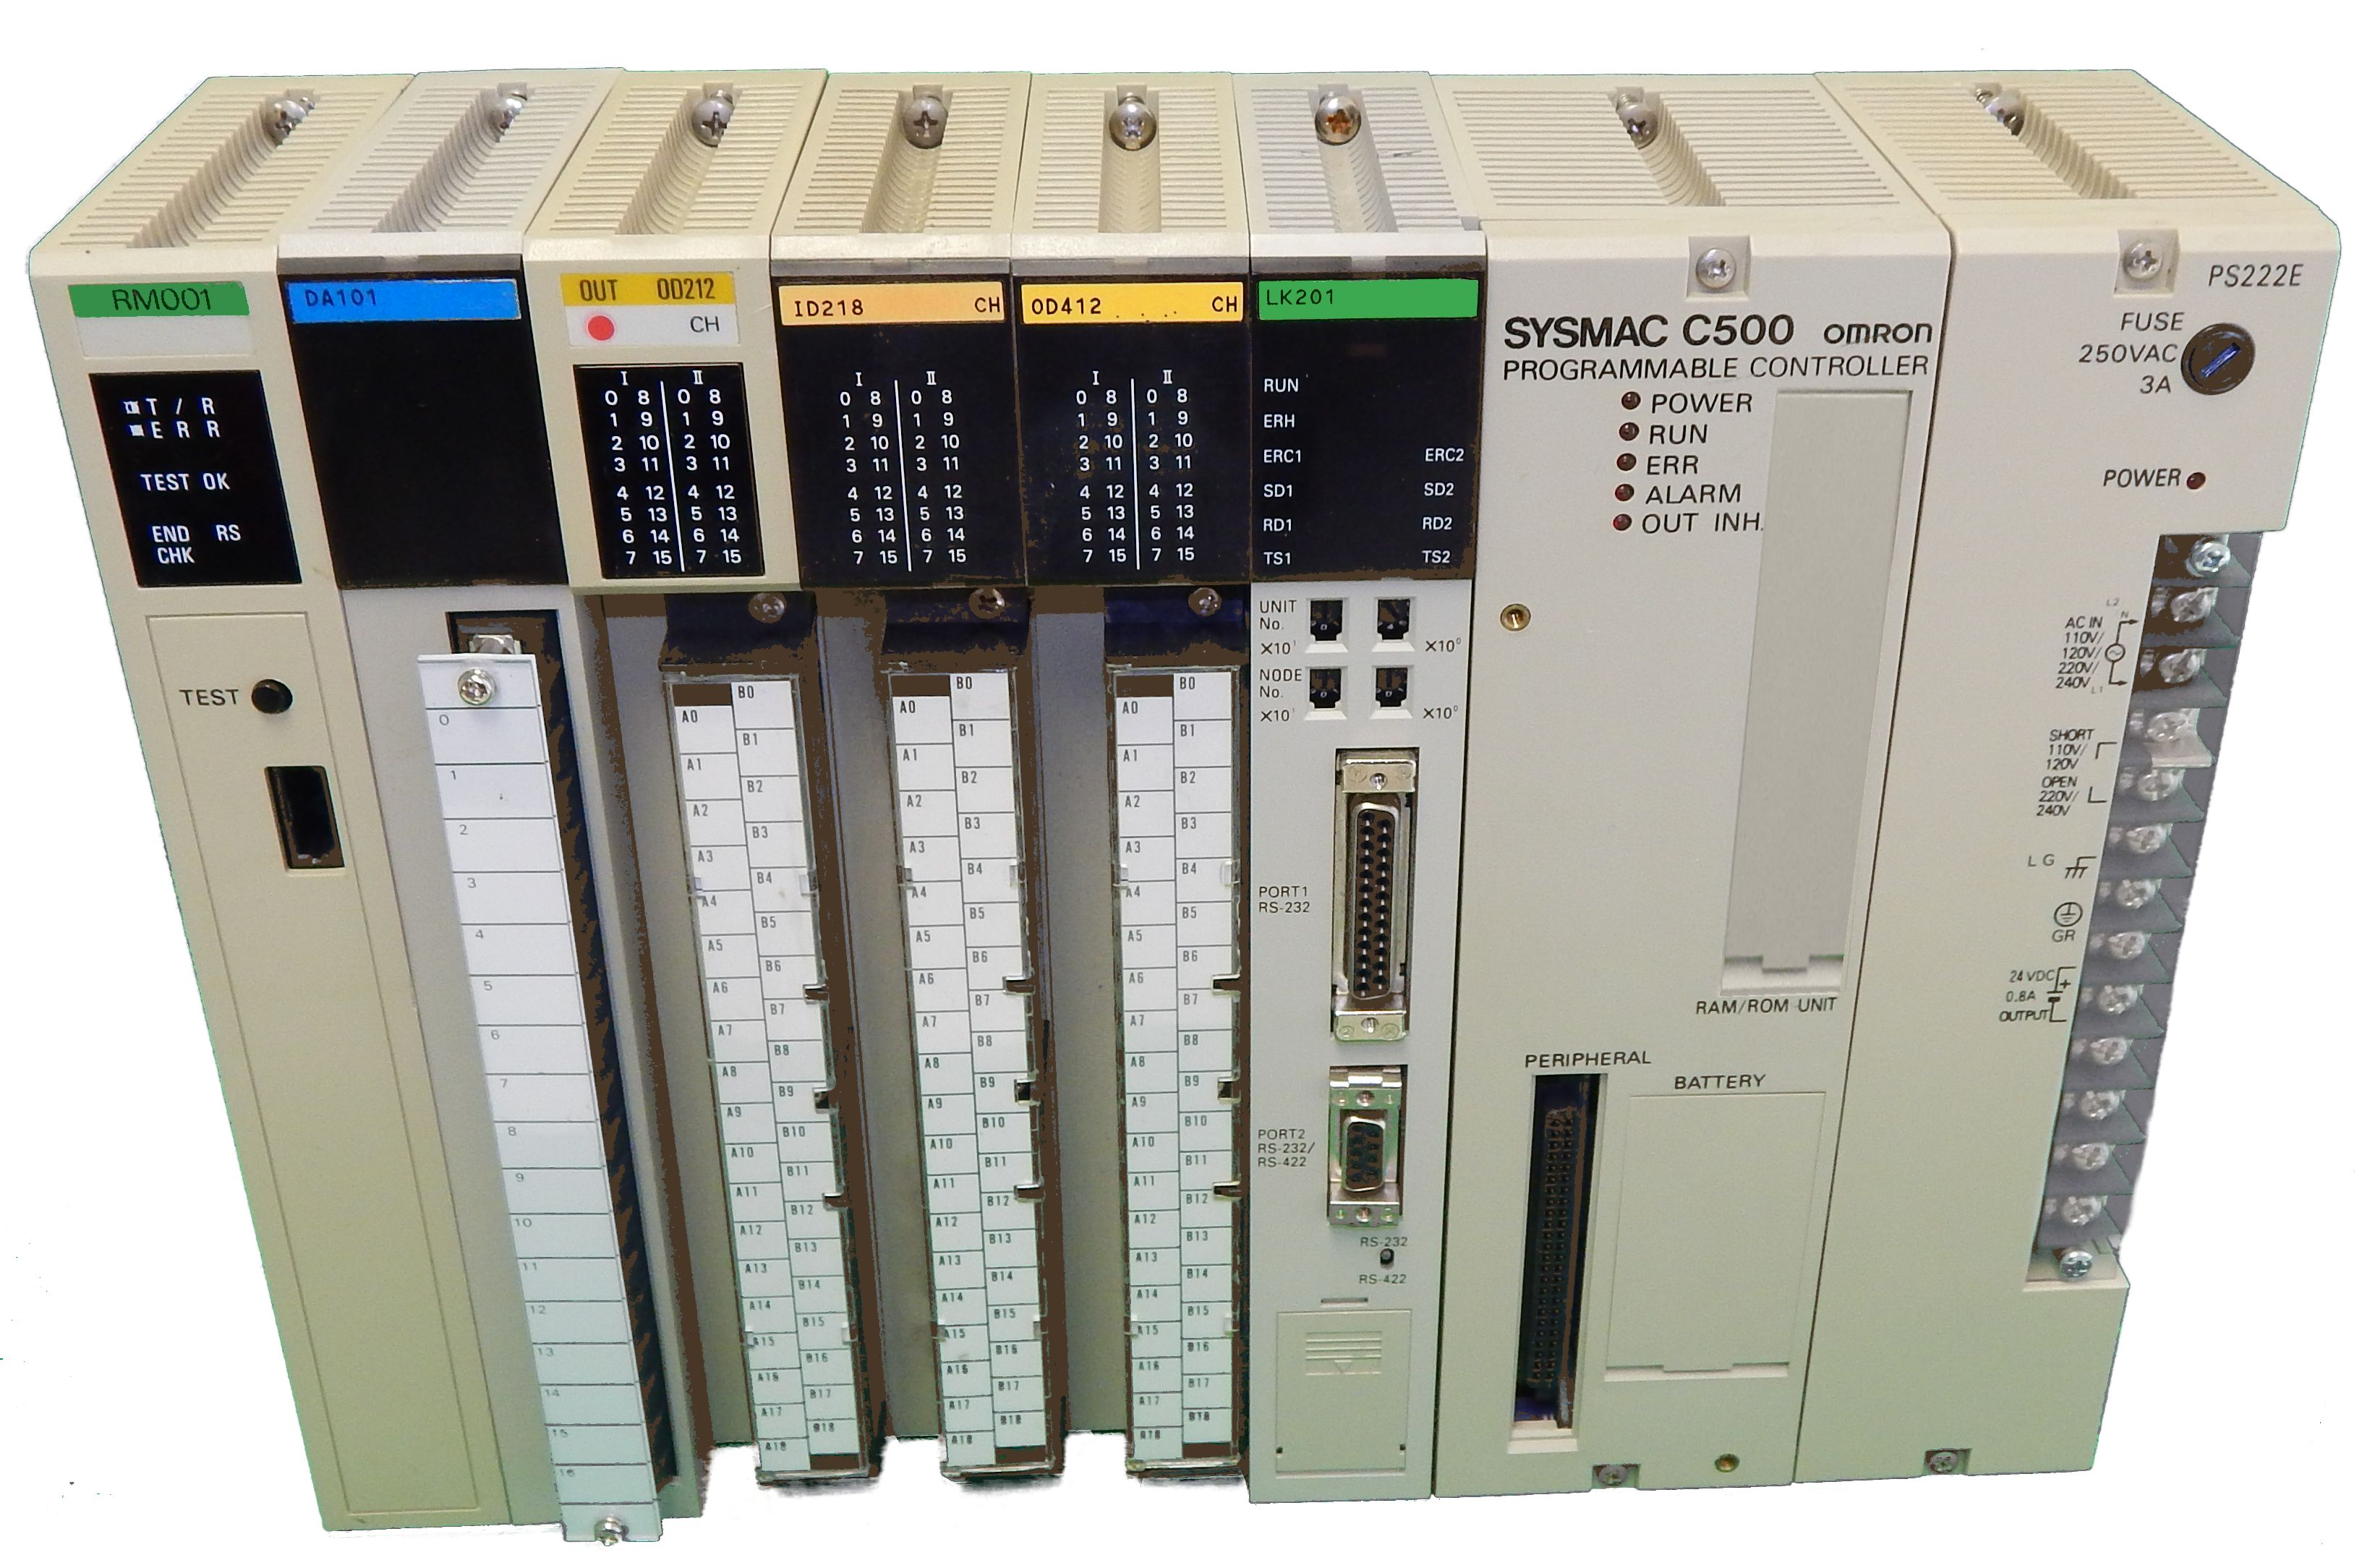 3G2C7-MD211